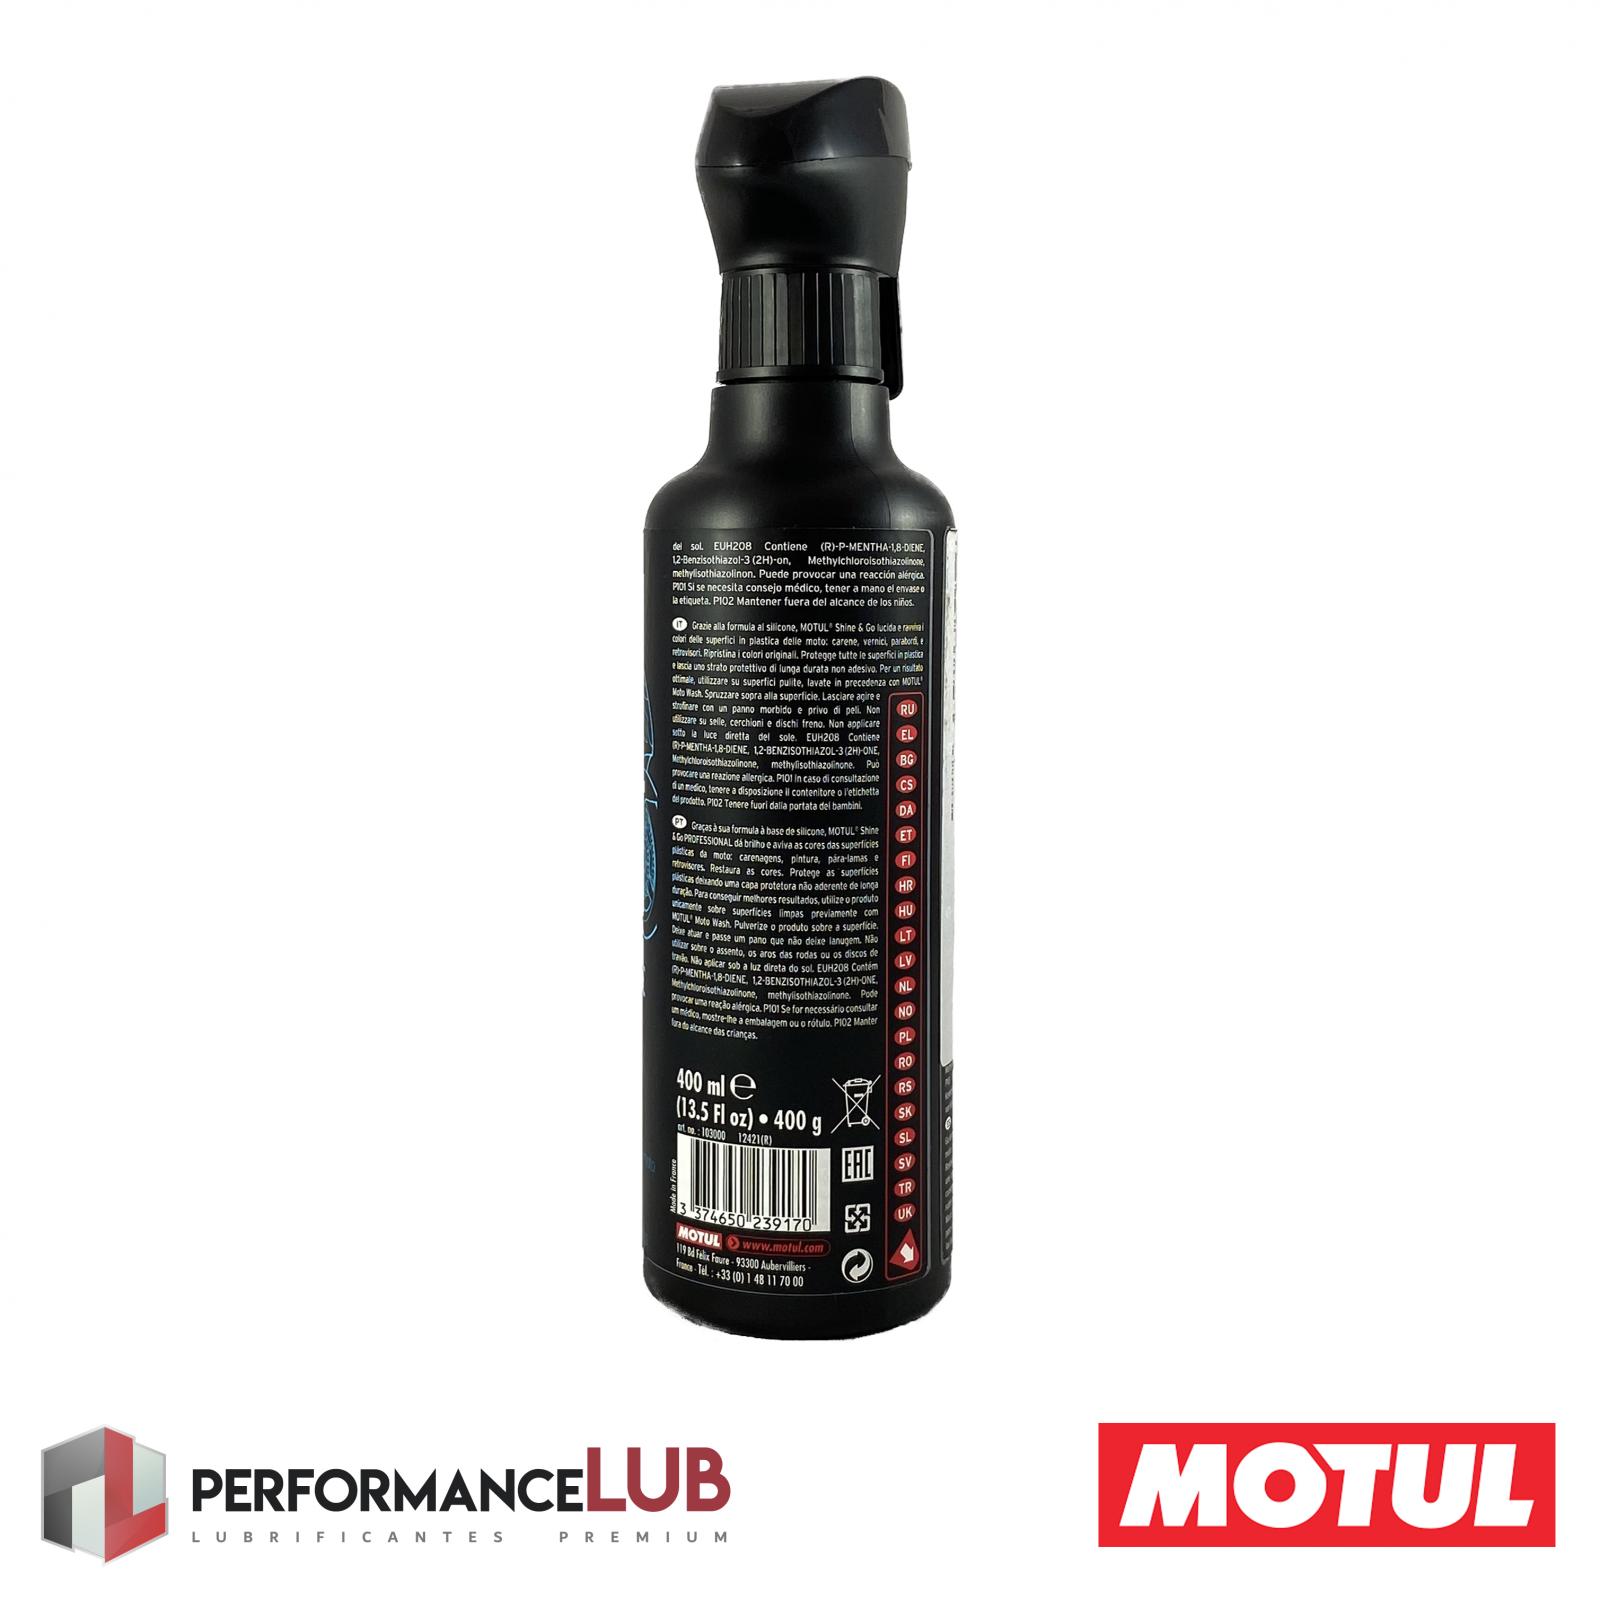 E5 Shine & Go - 400 ml - PerformanceLUB Lubrificantes Premium